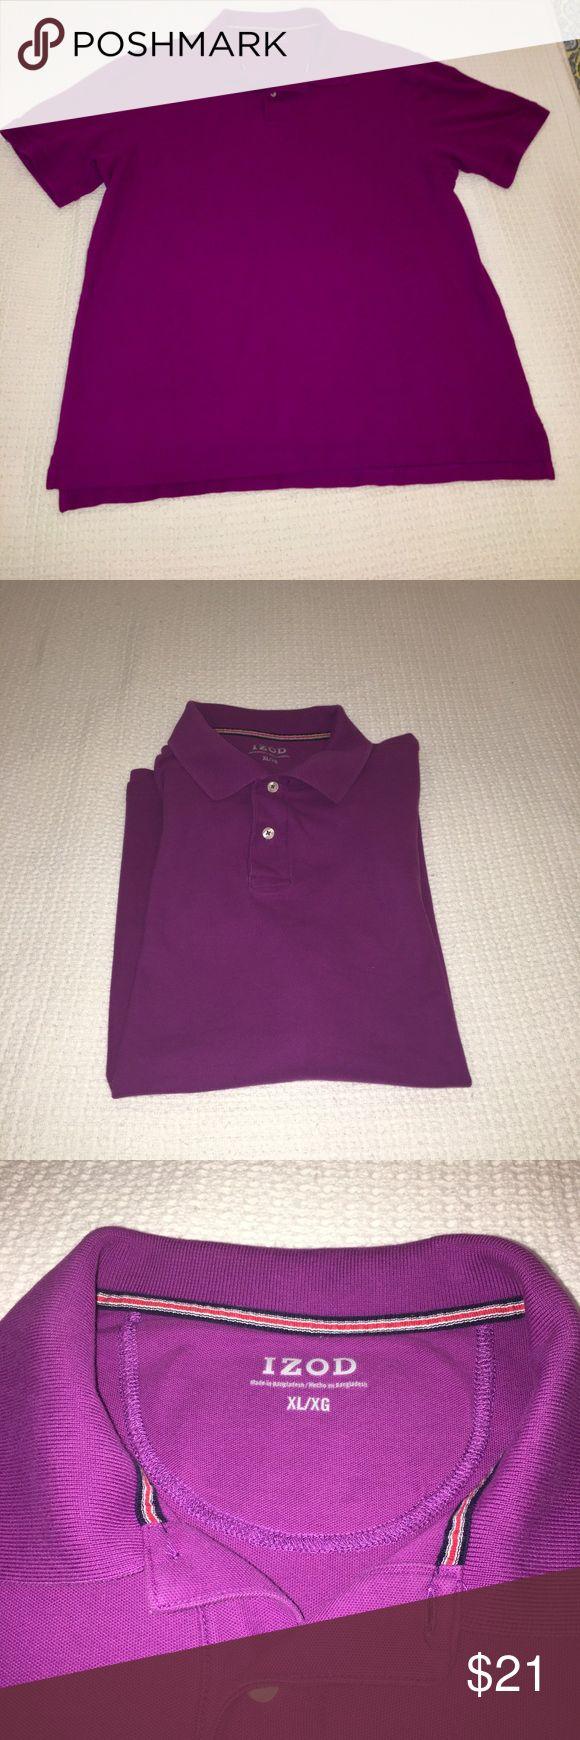 Men's IZOD polo shirt.  XL Great color - kind of purple/wine. Izod Shirts Polos